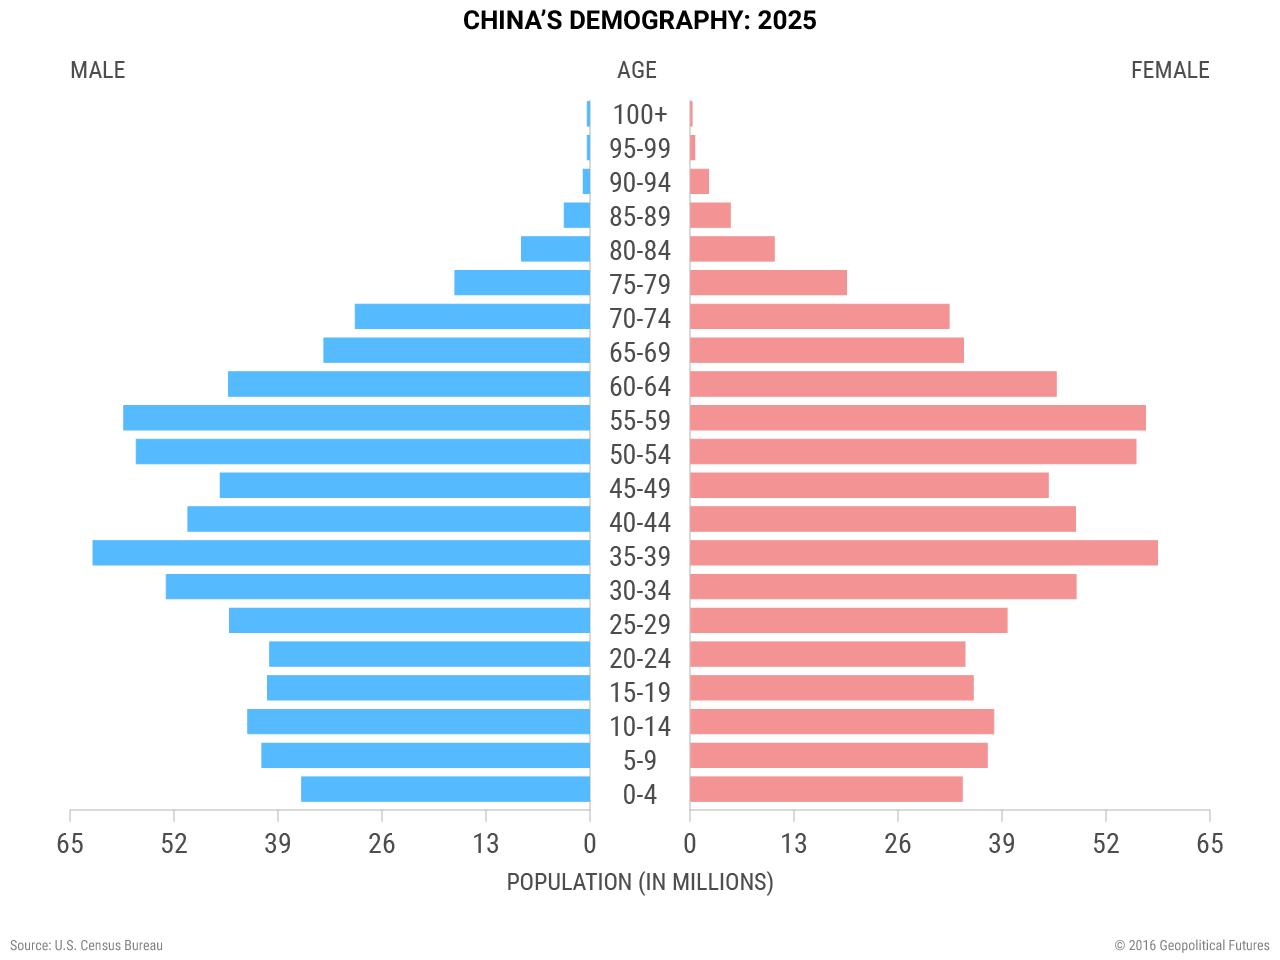 chinas-demography-2025